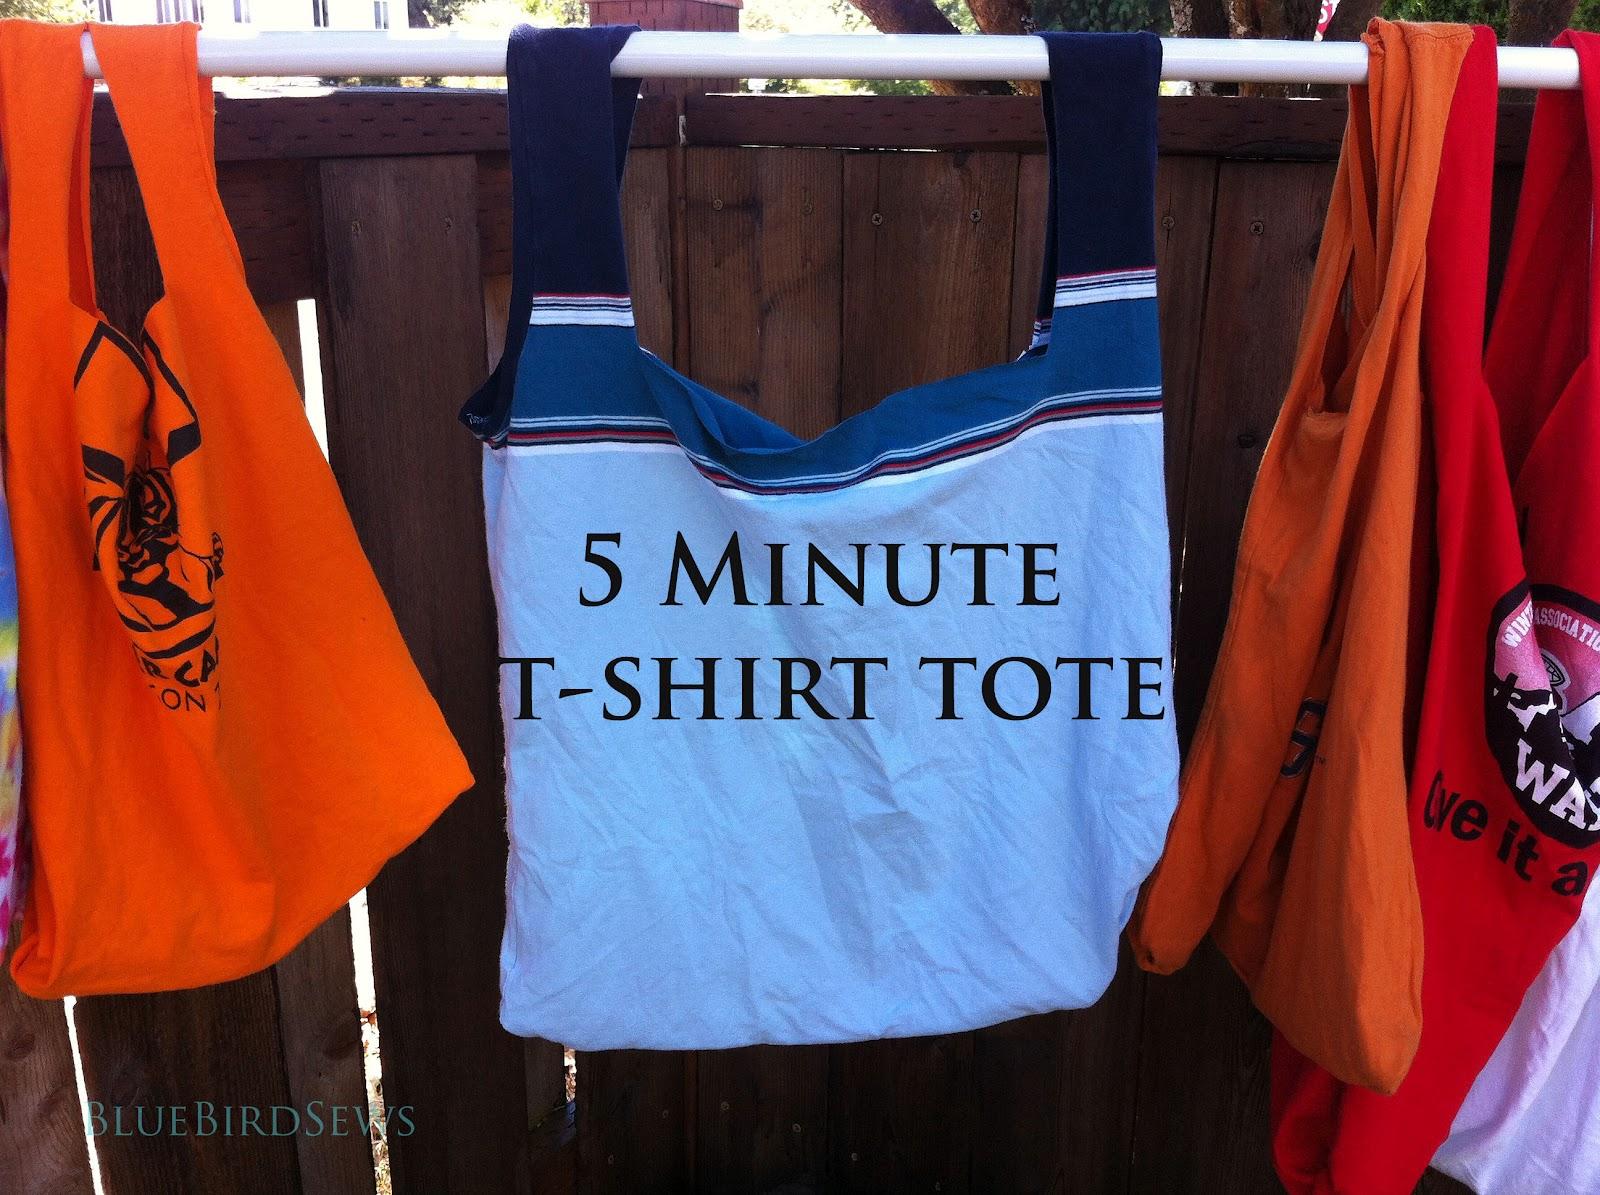 Blue Bird Sews: 5 Minute T-Shirt Tote Bag Tutorial